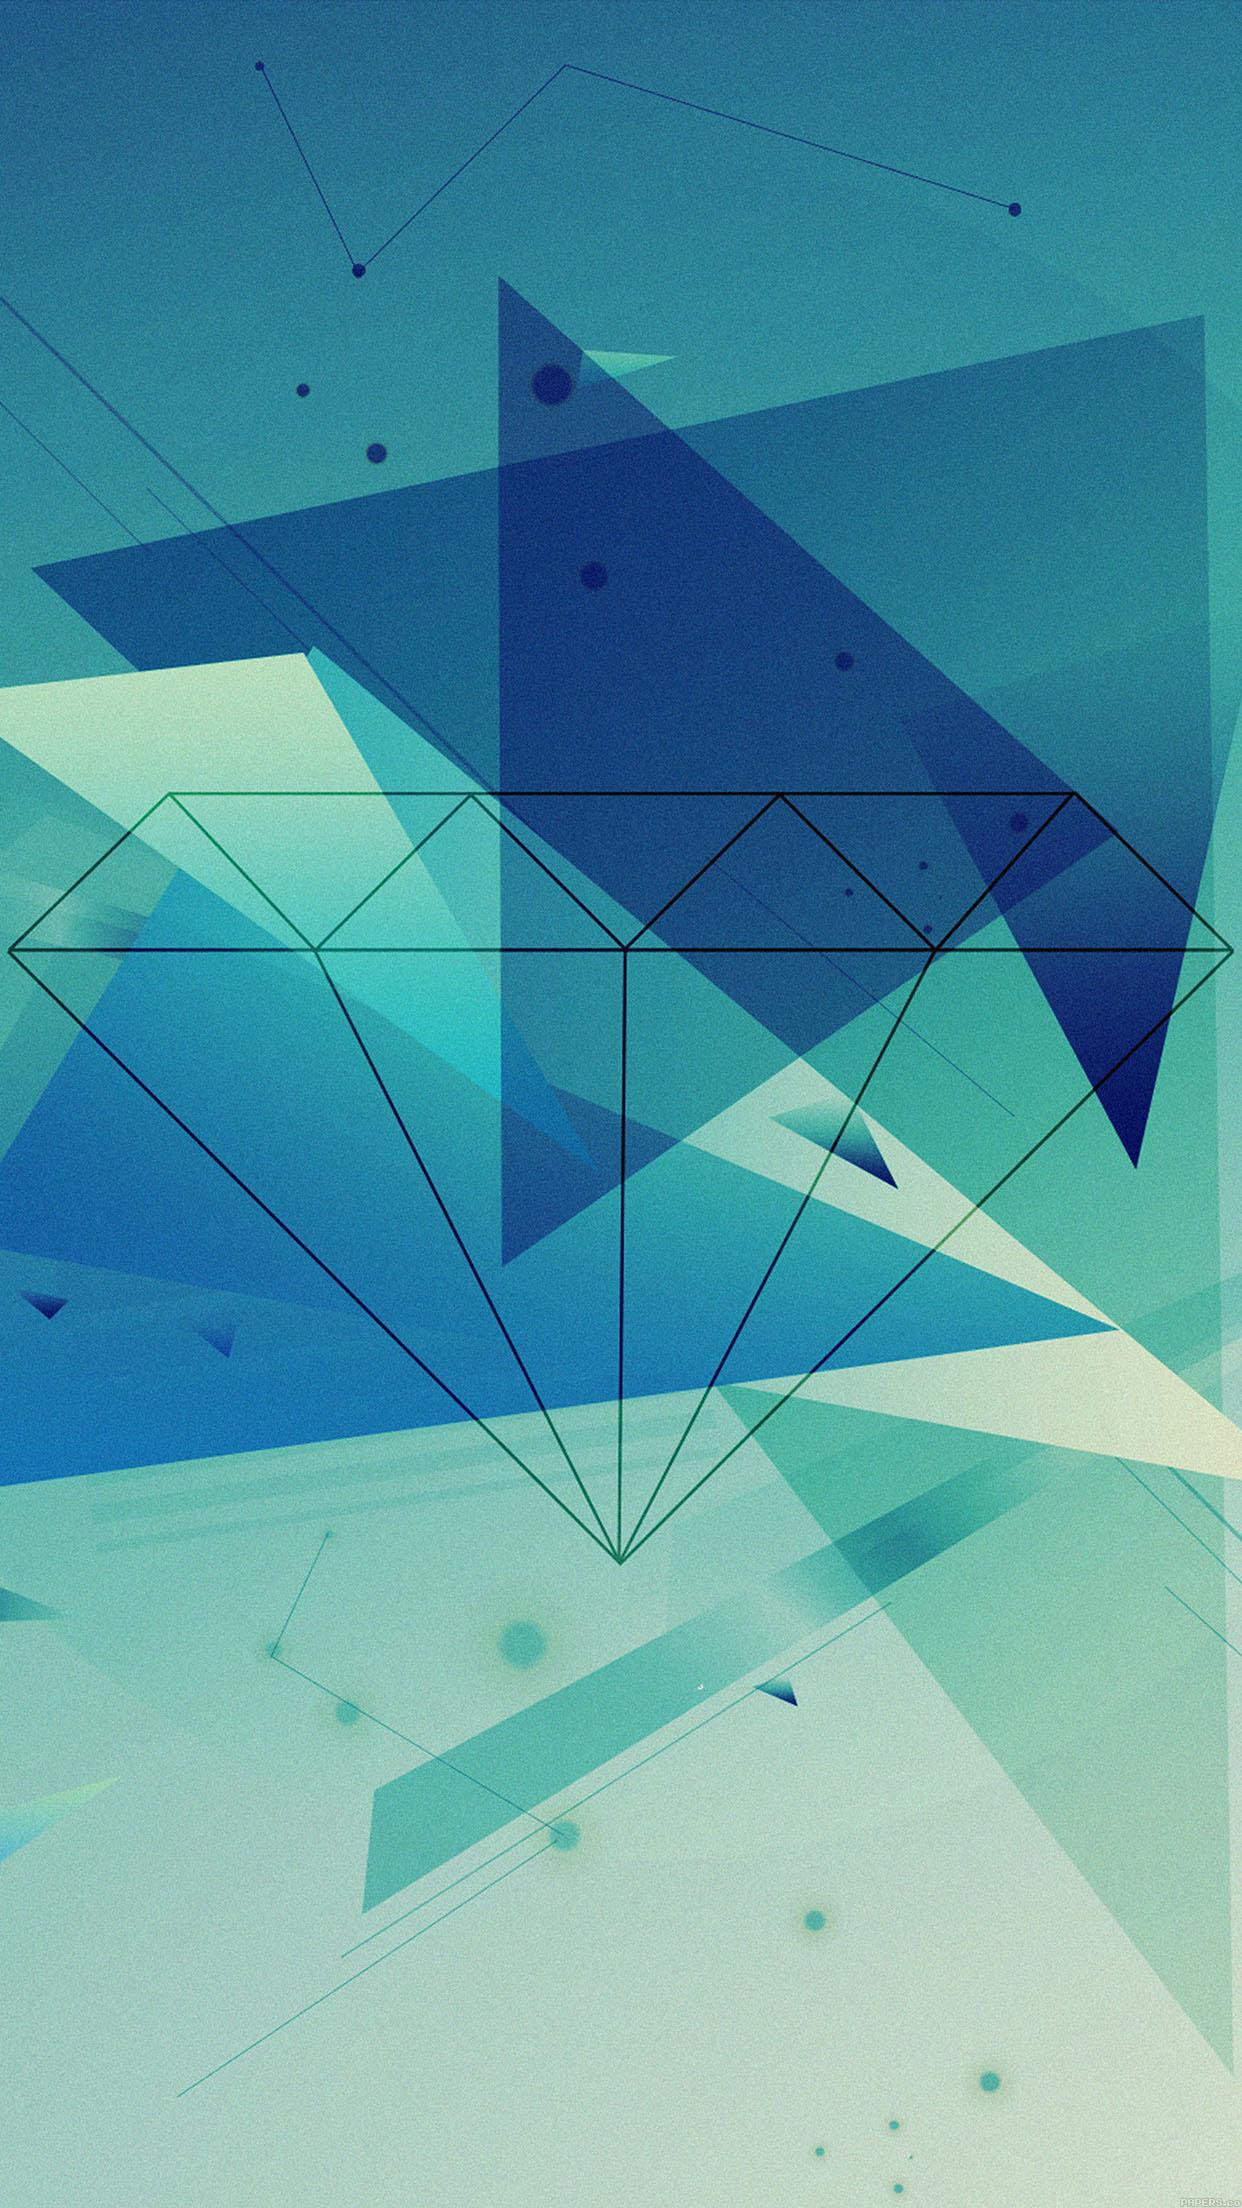 Cute Wallpaper For Phone Hd Vb89 Wallpaper Diamond Blue Illust Graphic Art Wallpaper